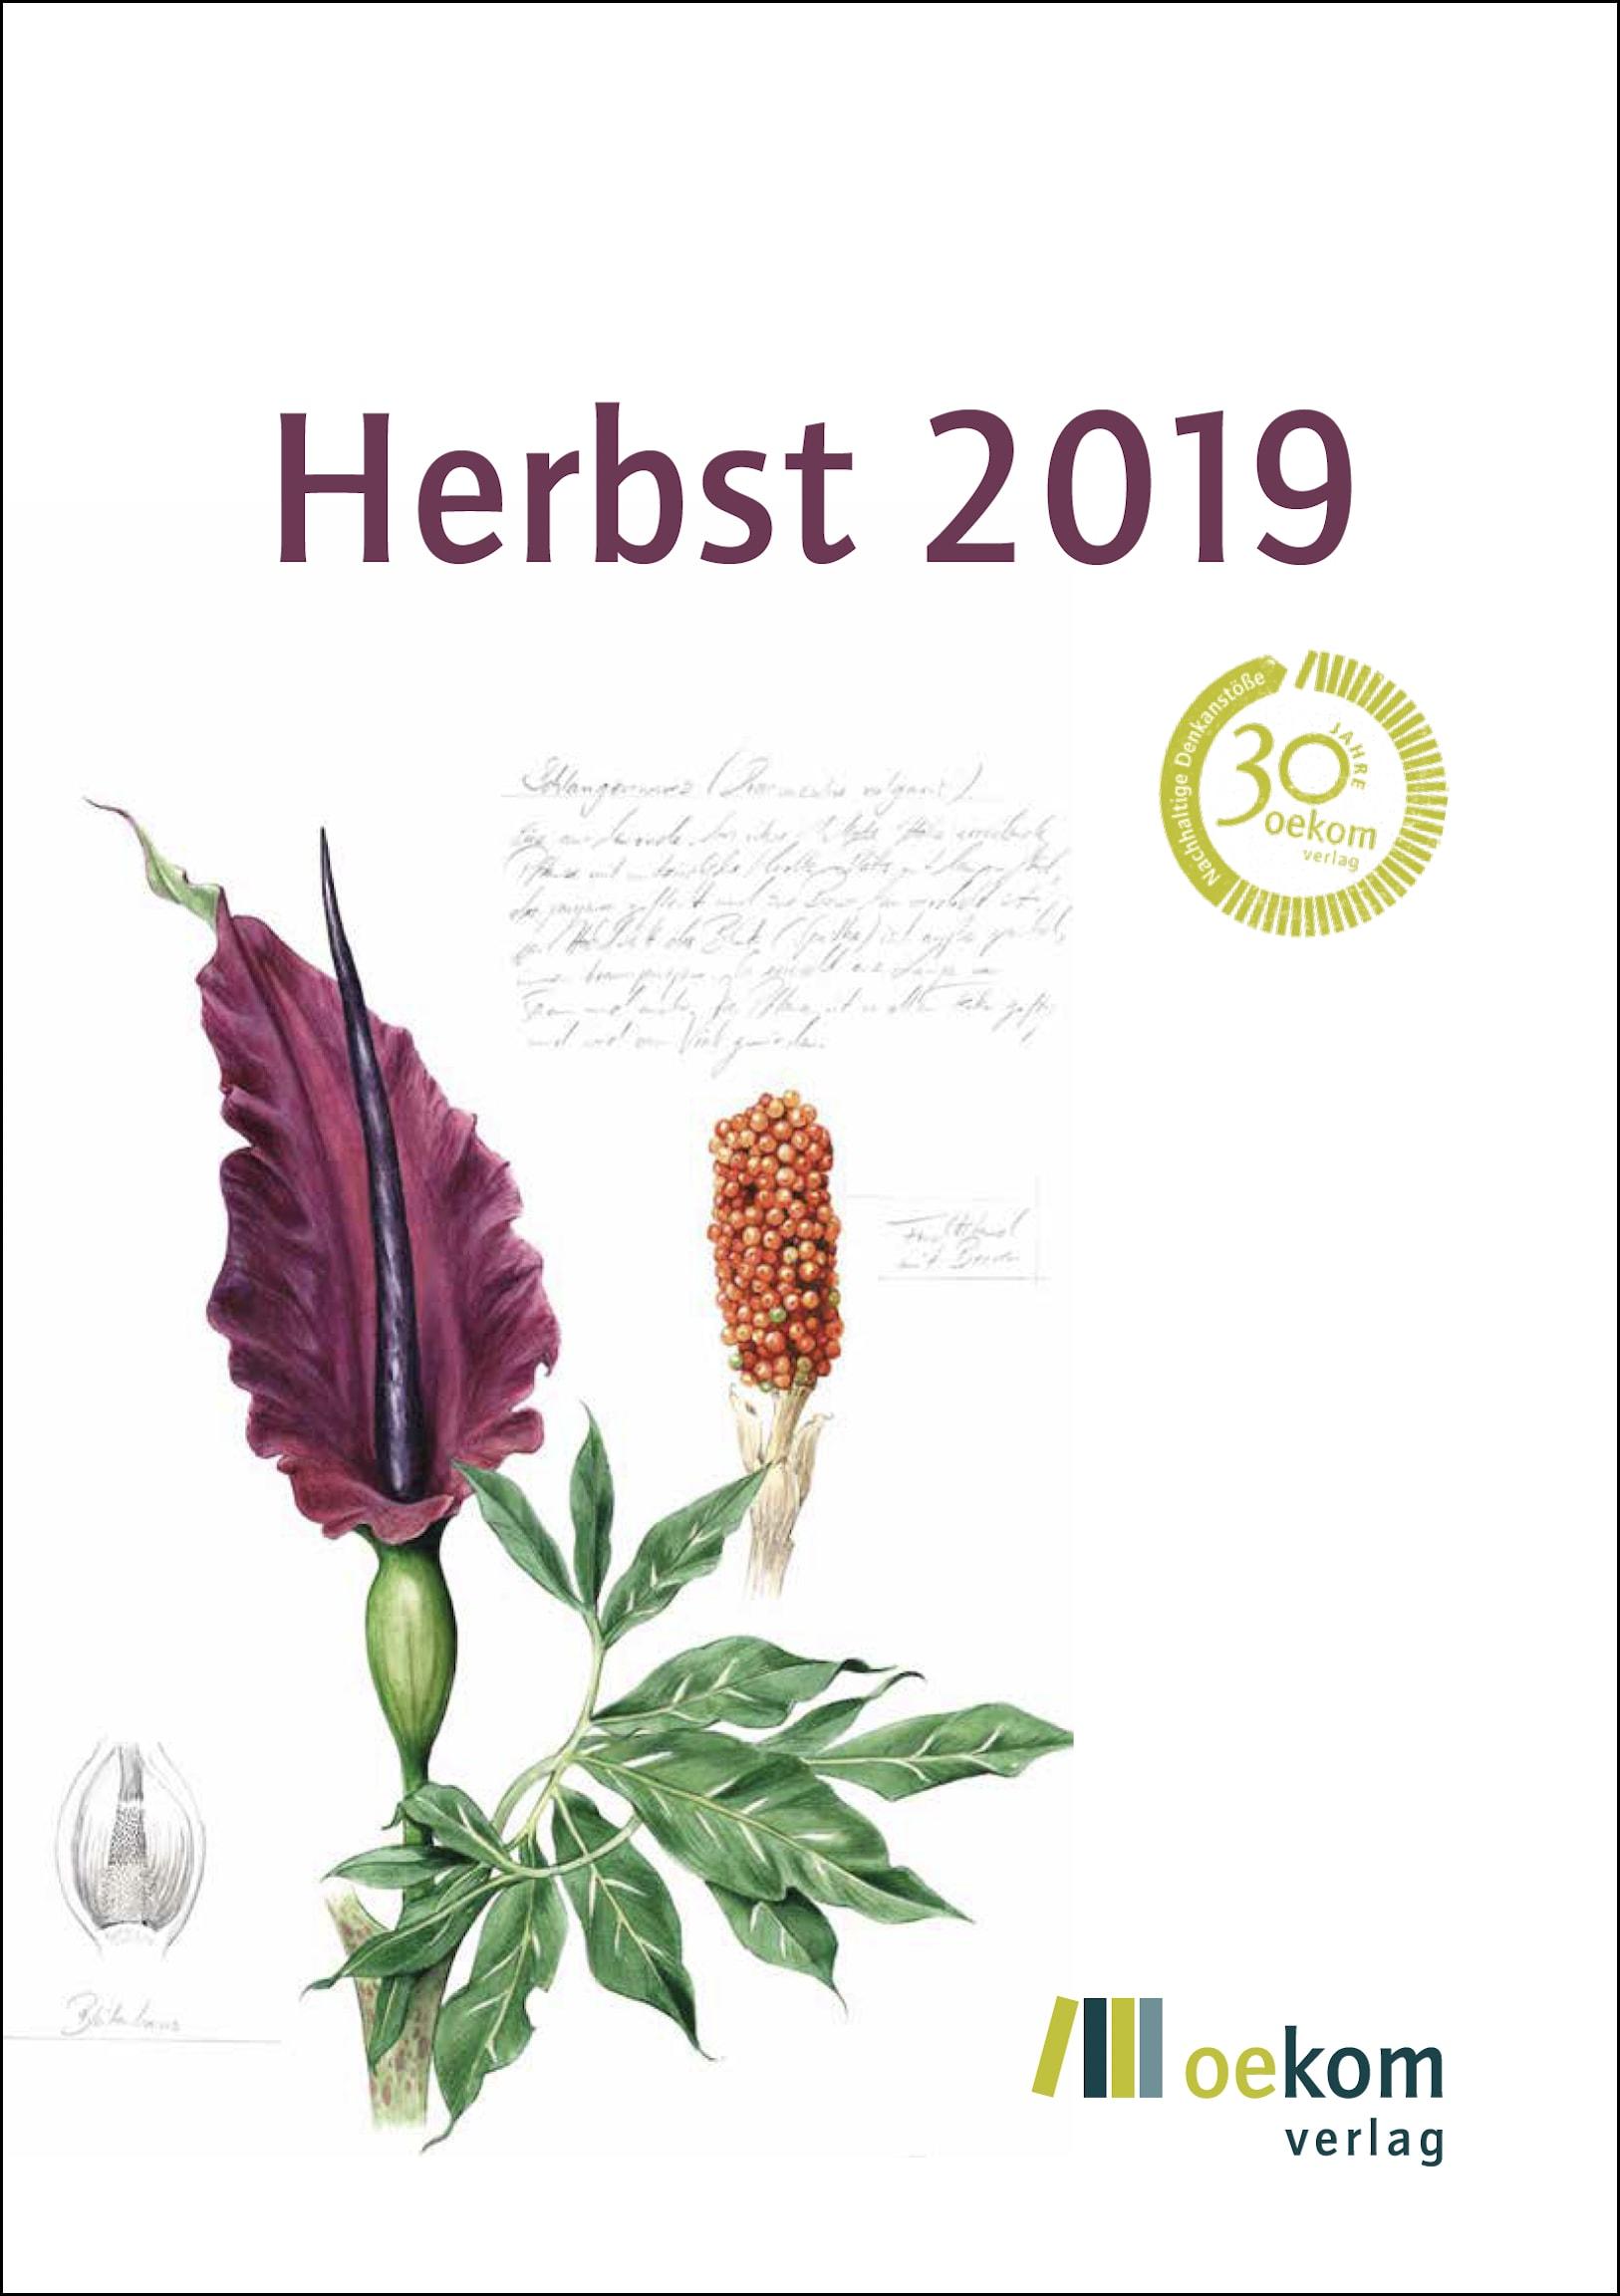 Programm oekom verlag Herbst 2019